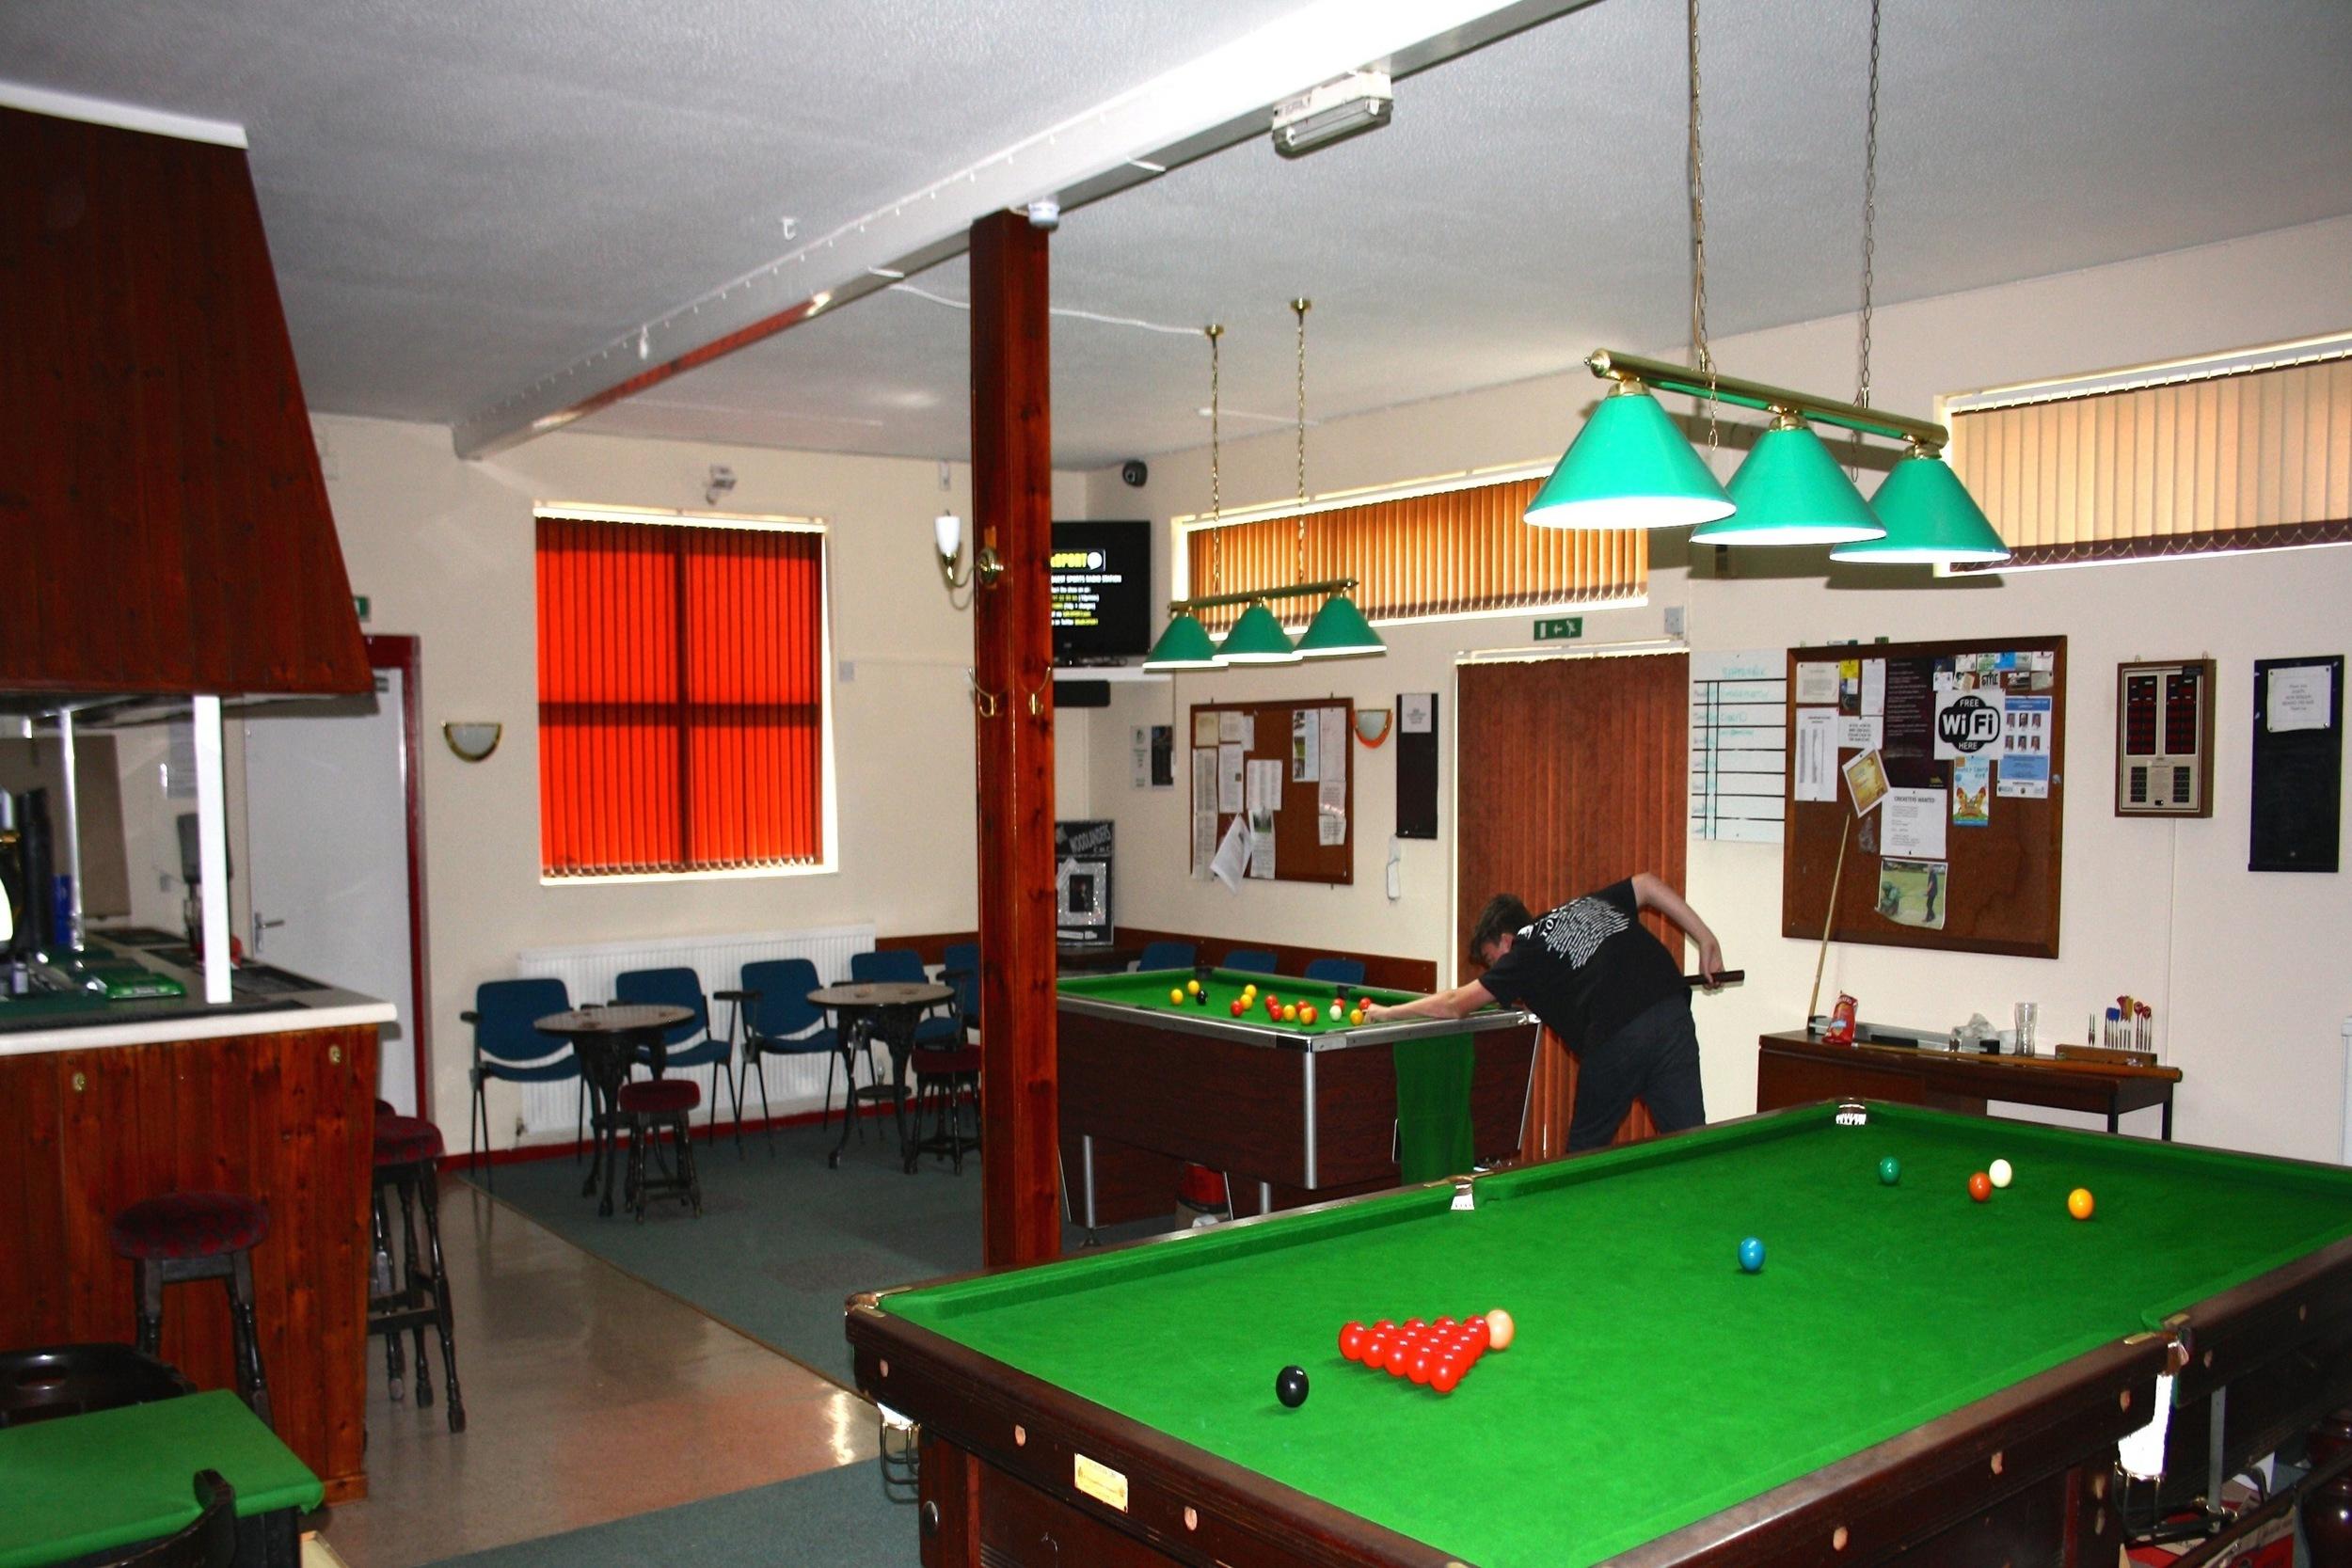 Woodlands Social Club - Snooker